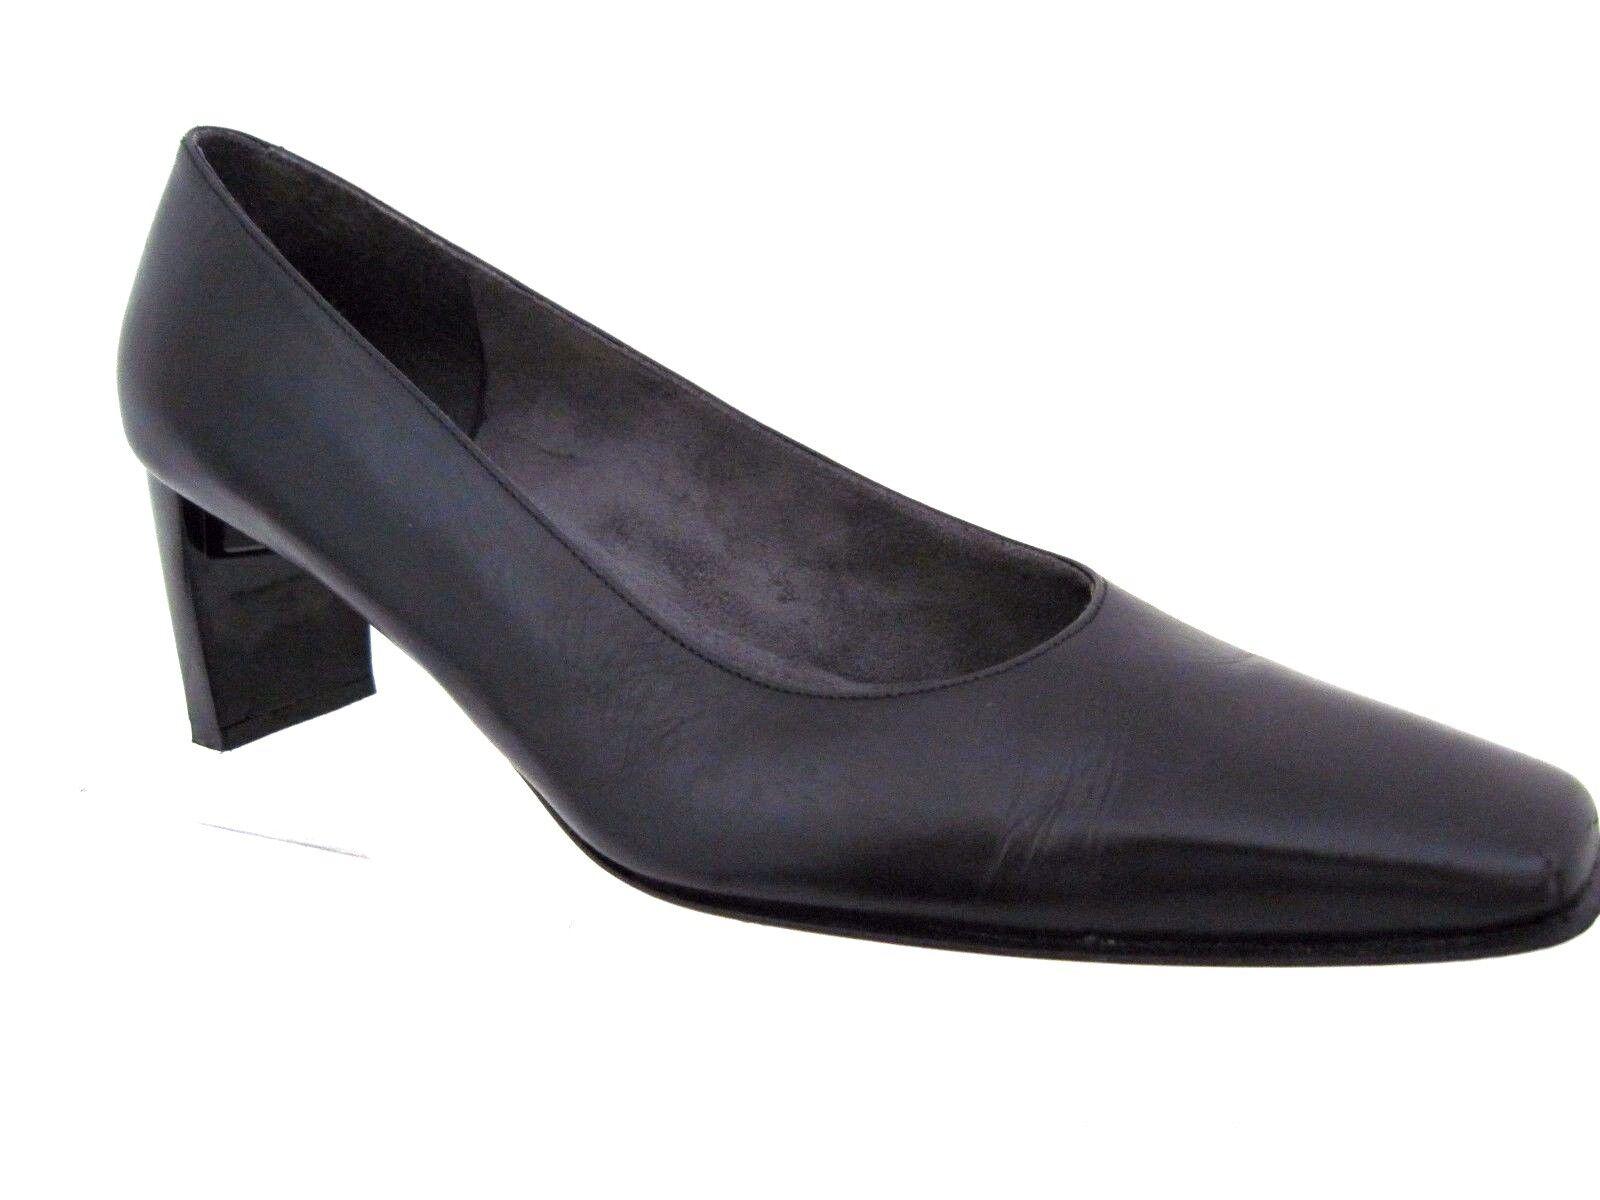 STUART WEITZMAN Black Leather Square Toe Heels Pumps Size 8 AA Spain